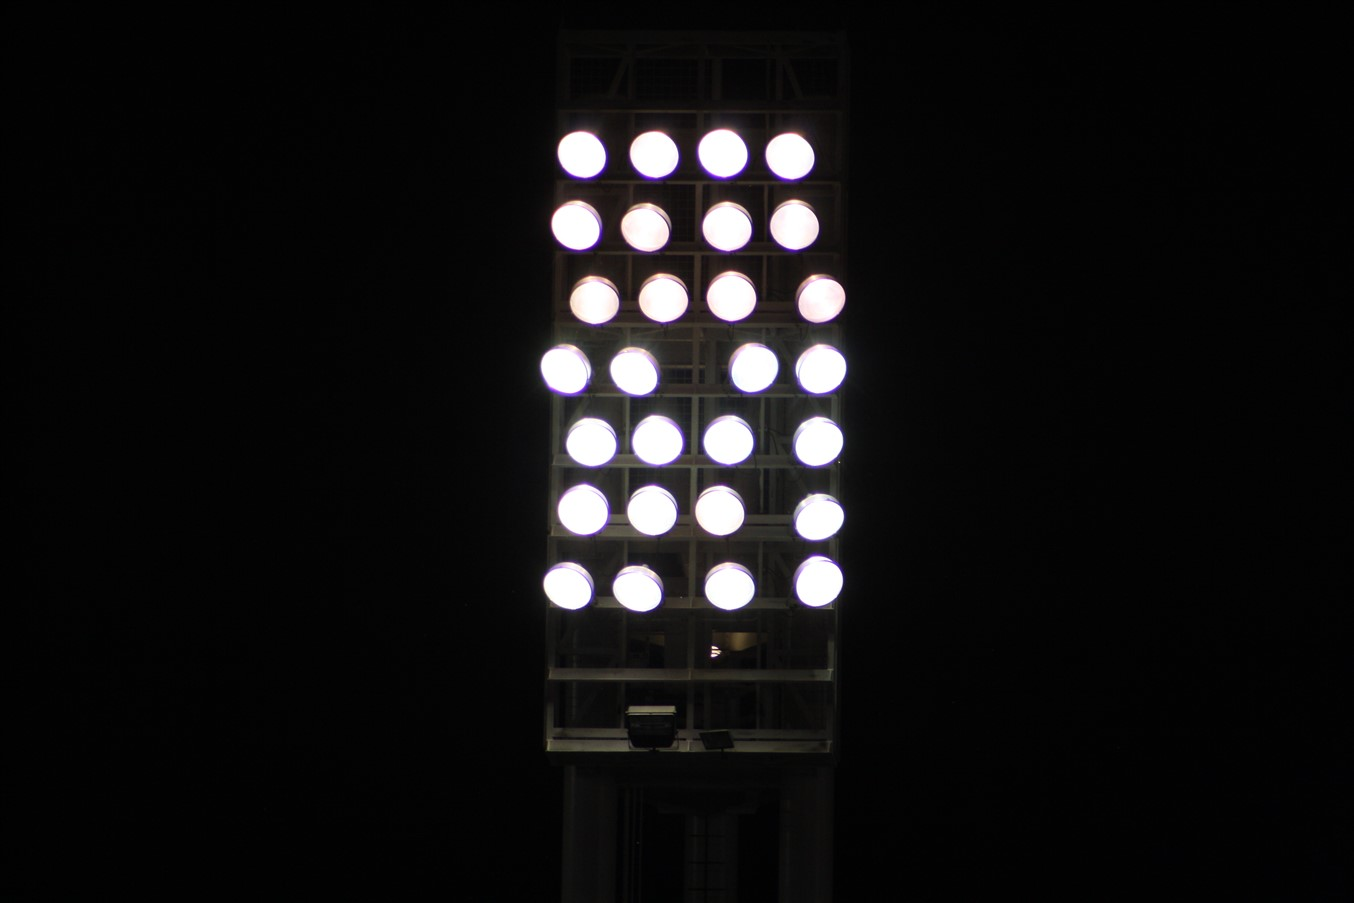 2009 06 15 Cleveland Indians 32.jpg